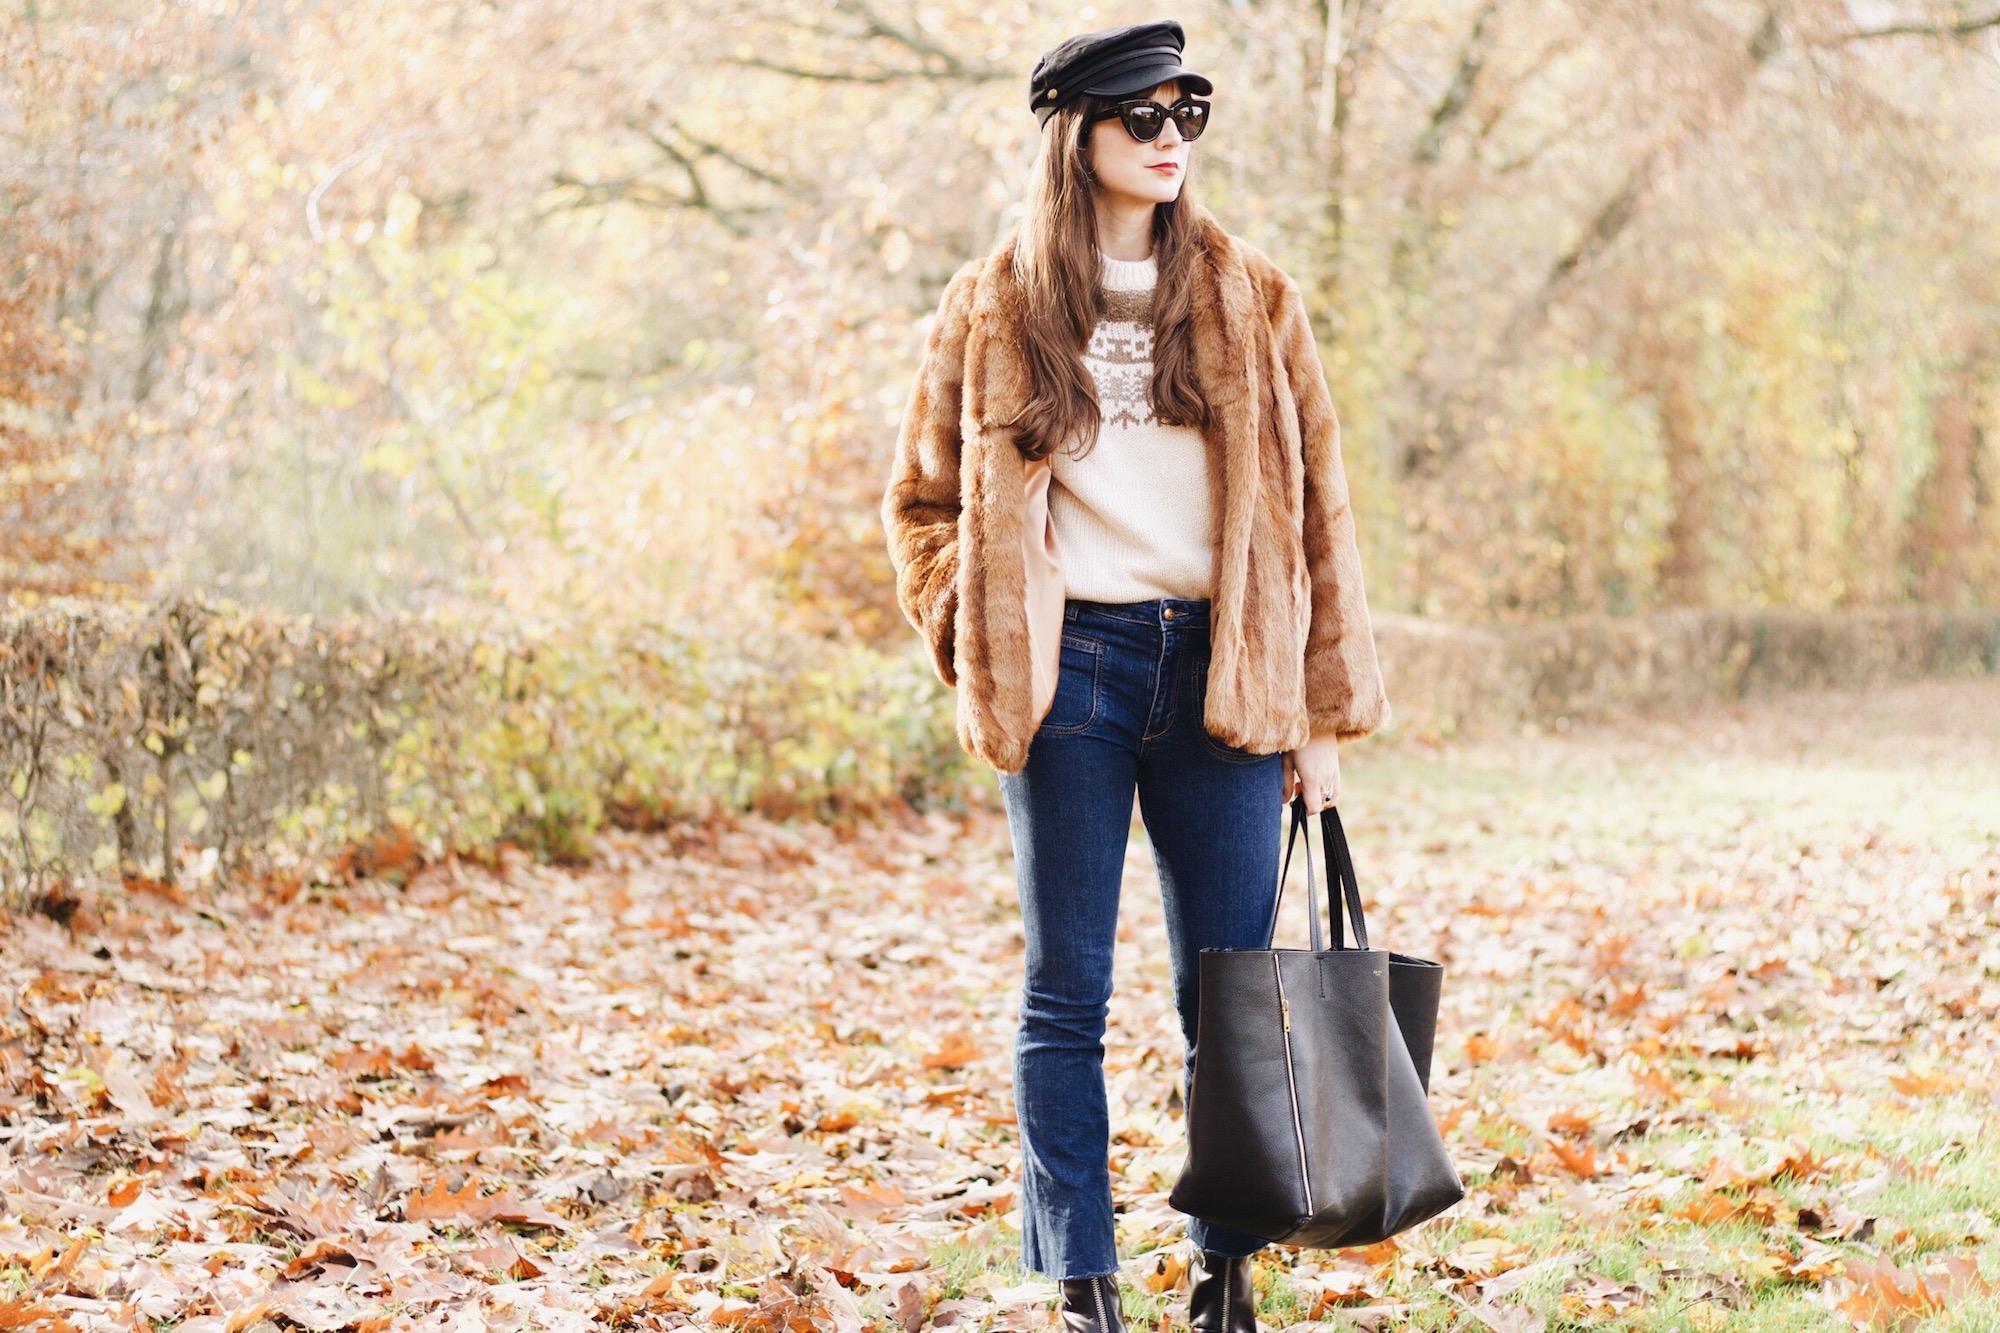 Modeblog Outfit Fake Fur Felljacke Céline Cabas Bag und Kick Flare Jeans sowie Norwegerpullover